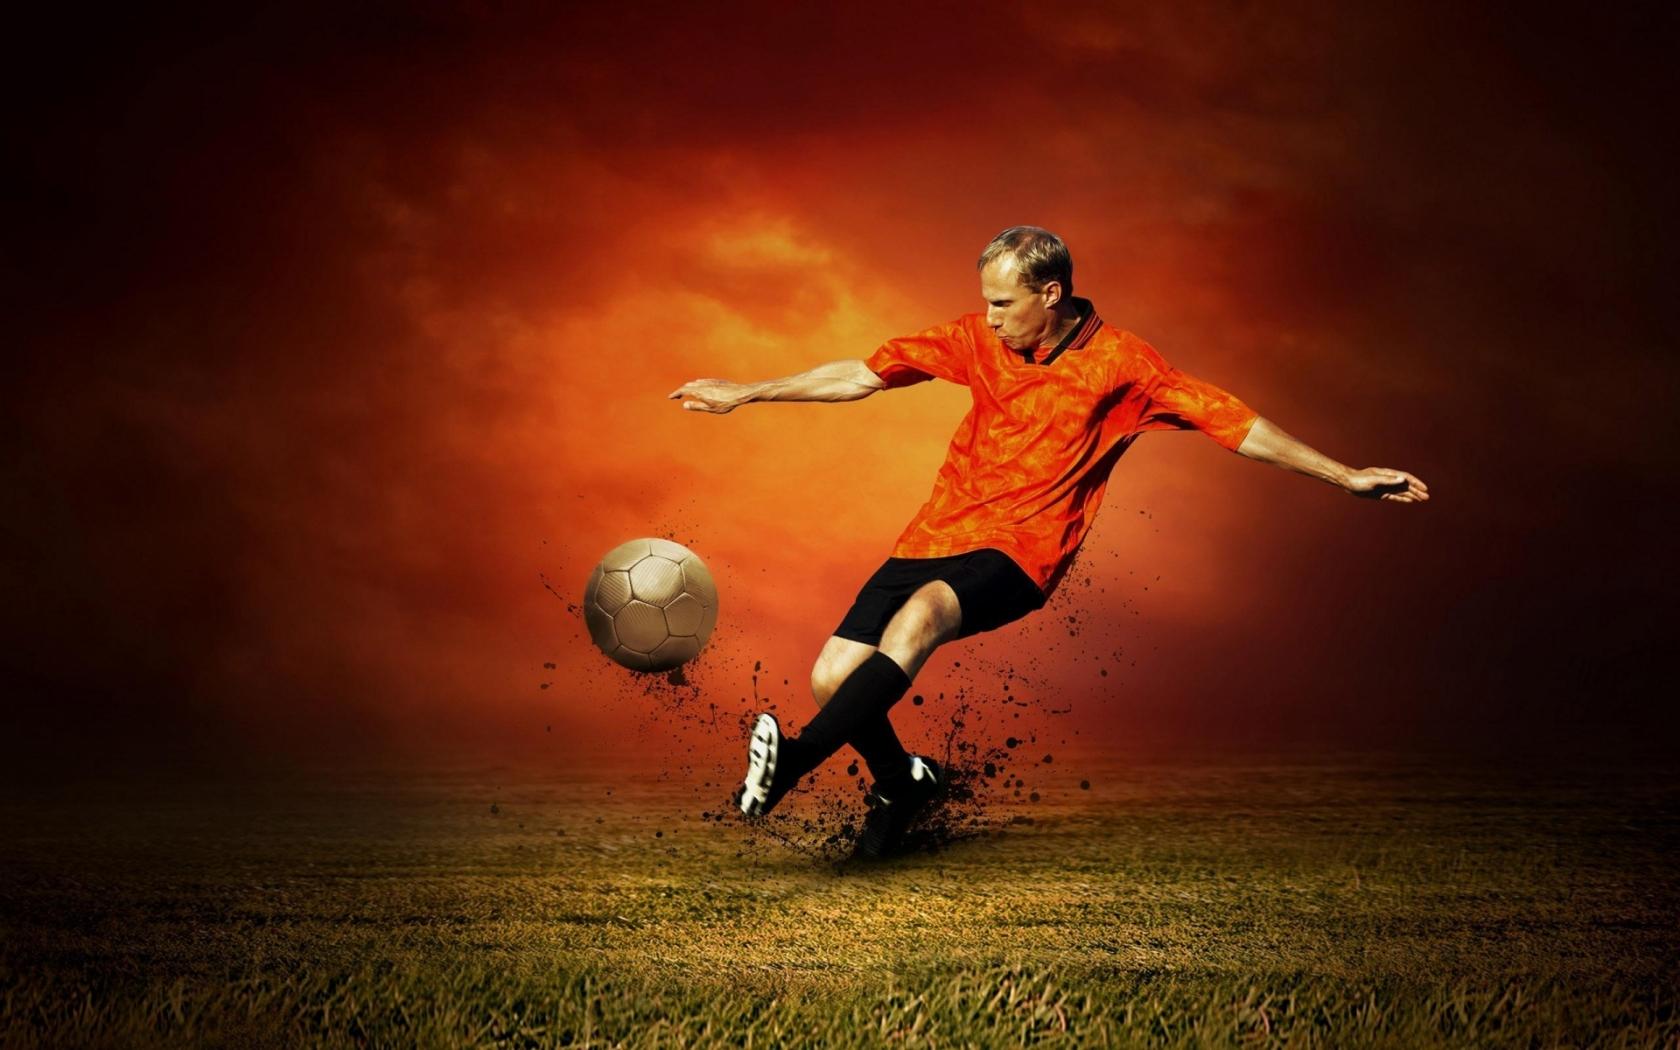 Спорт футбол удар по мячу обои рабочий